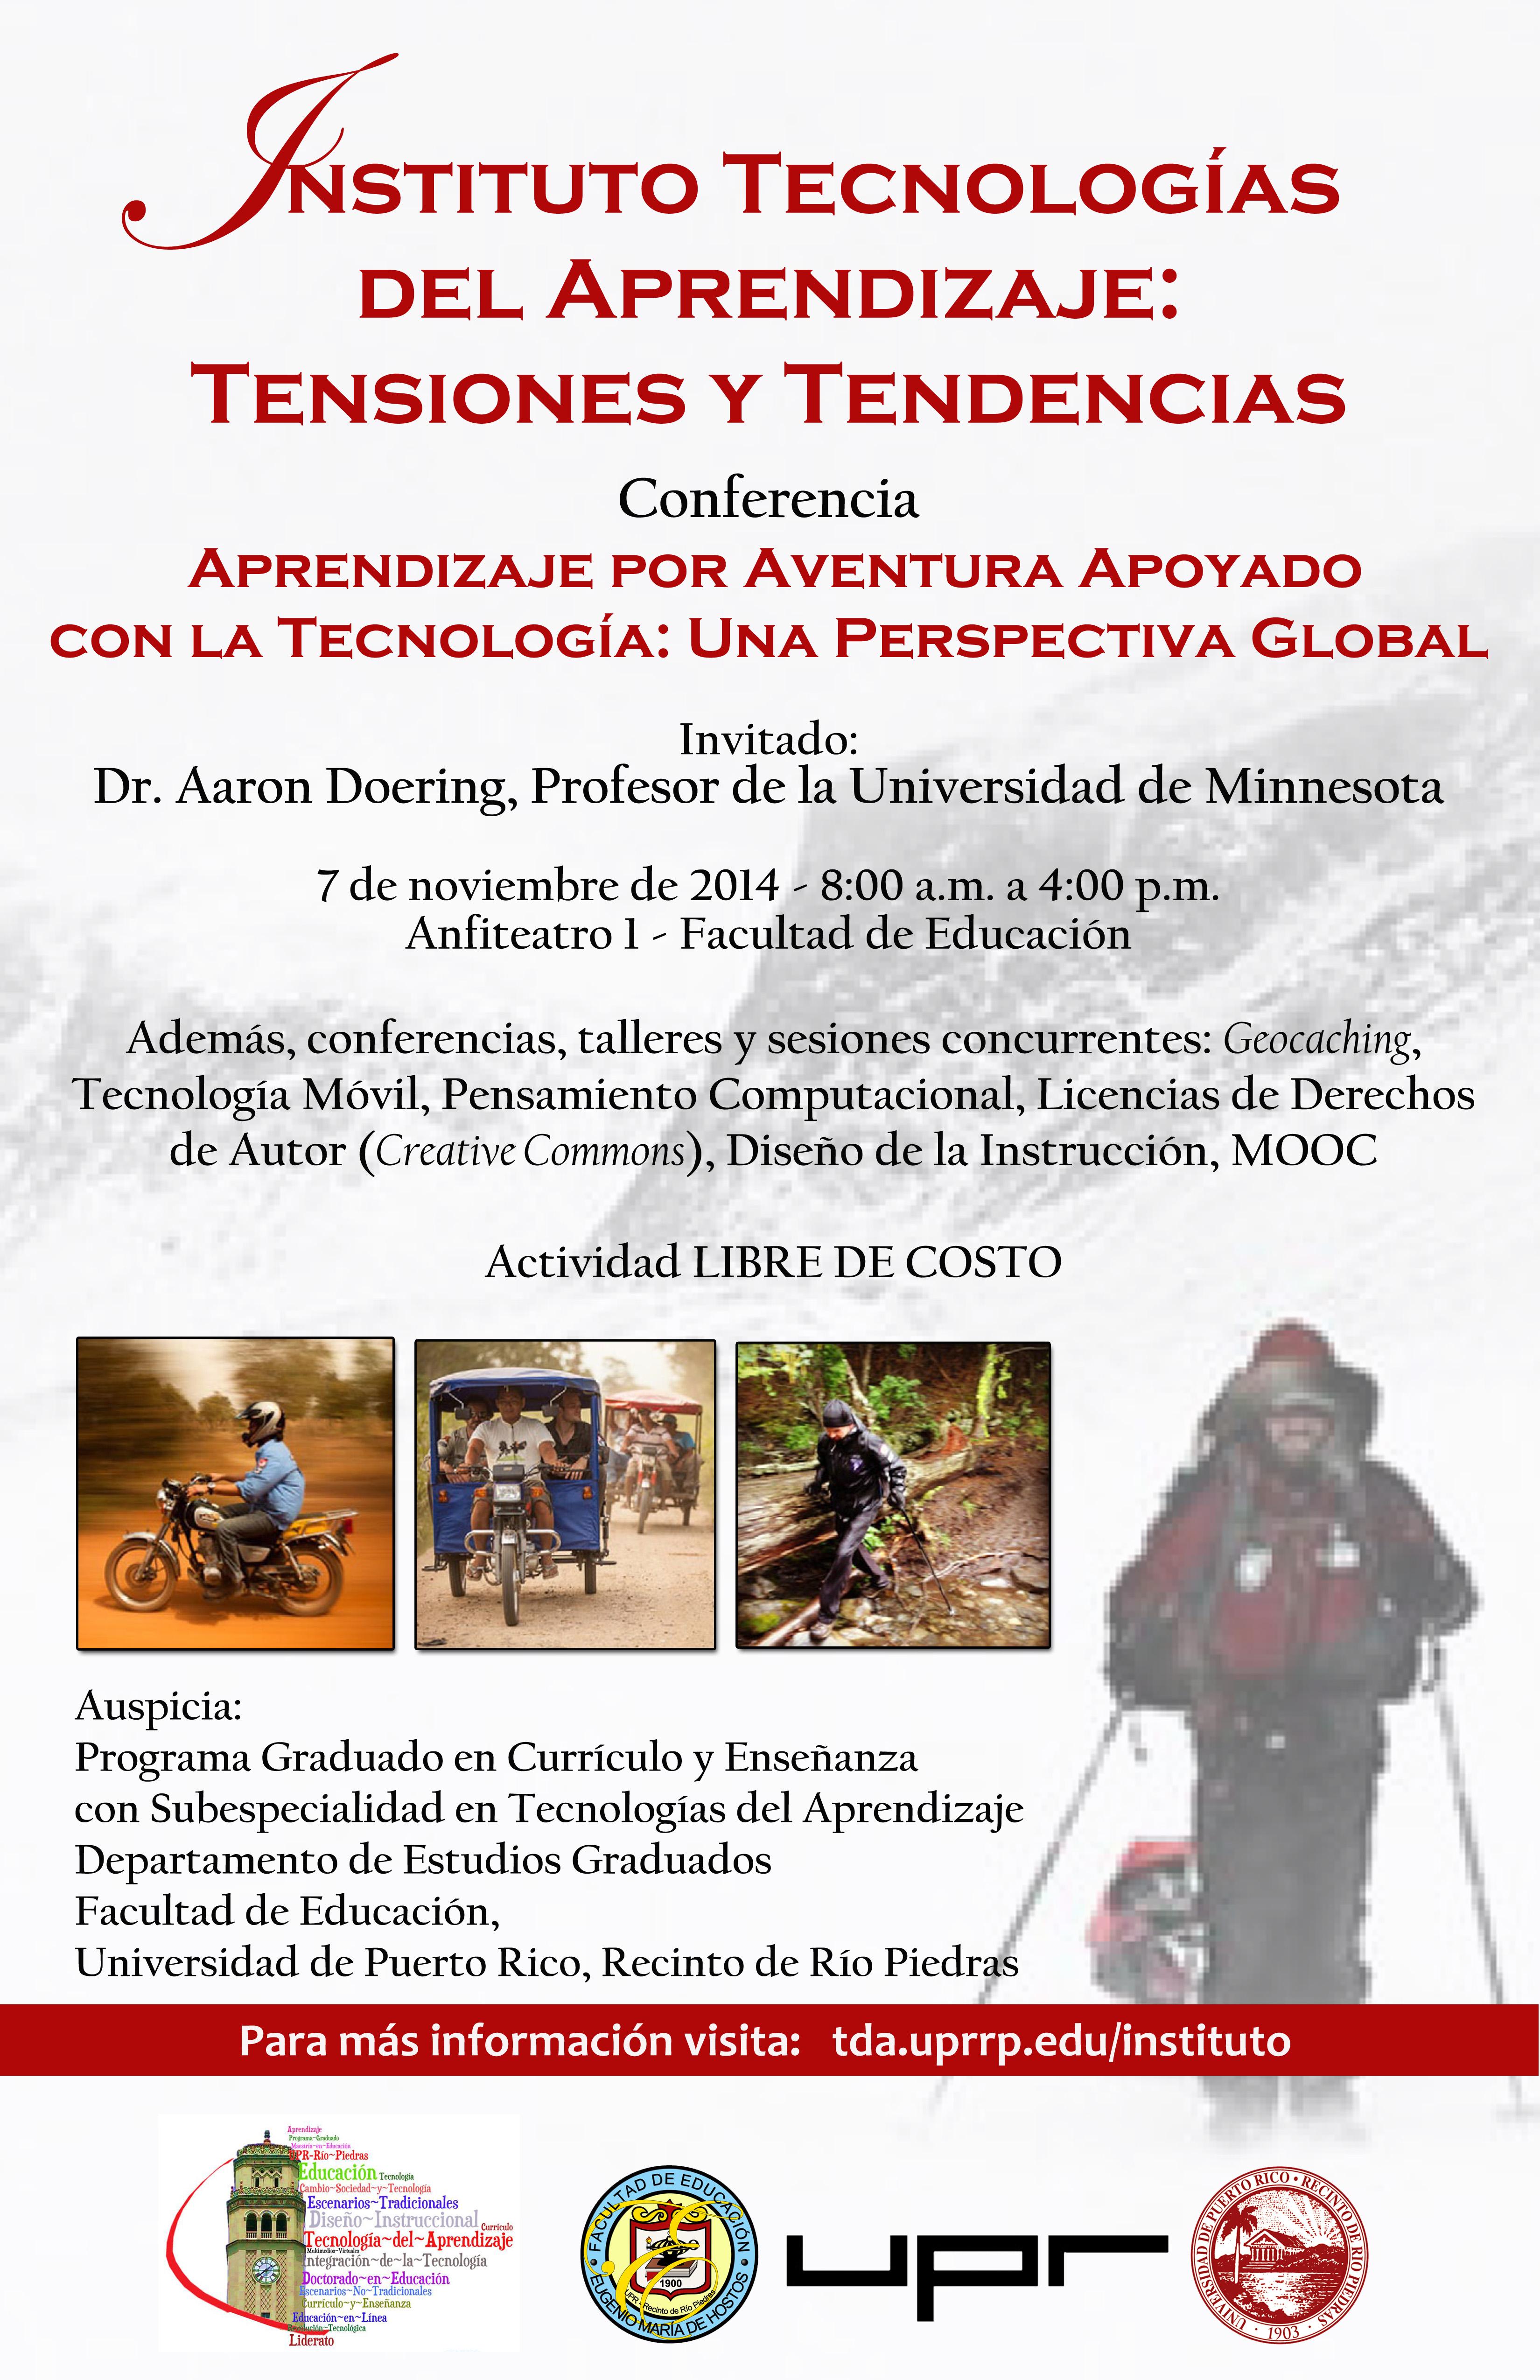 promo Instituto Tecnologias Aprendizaje con edicionespsd copy